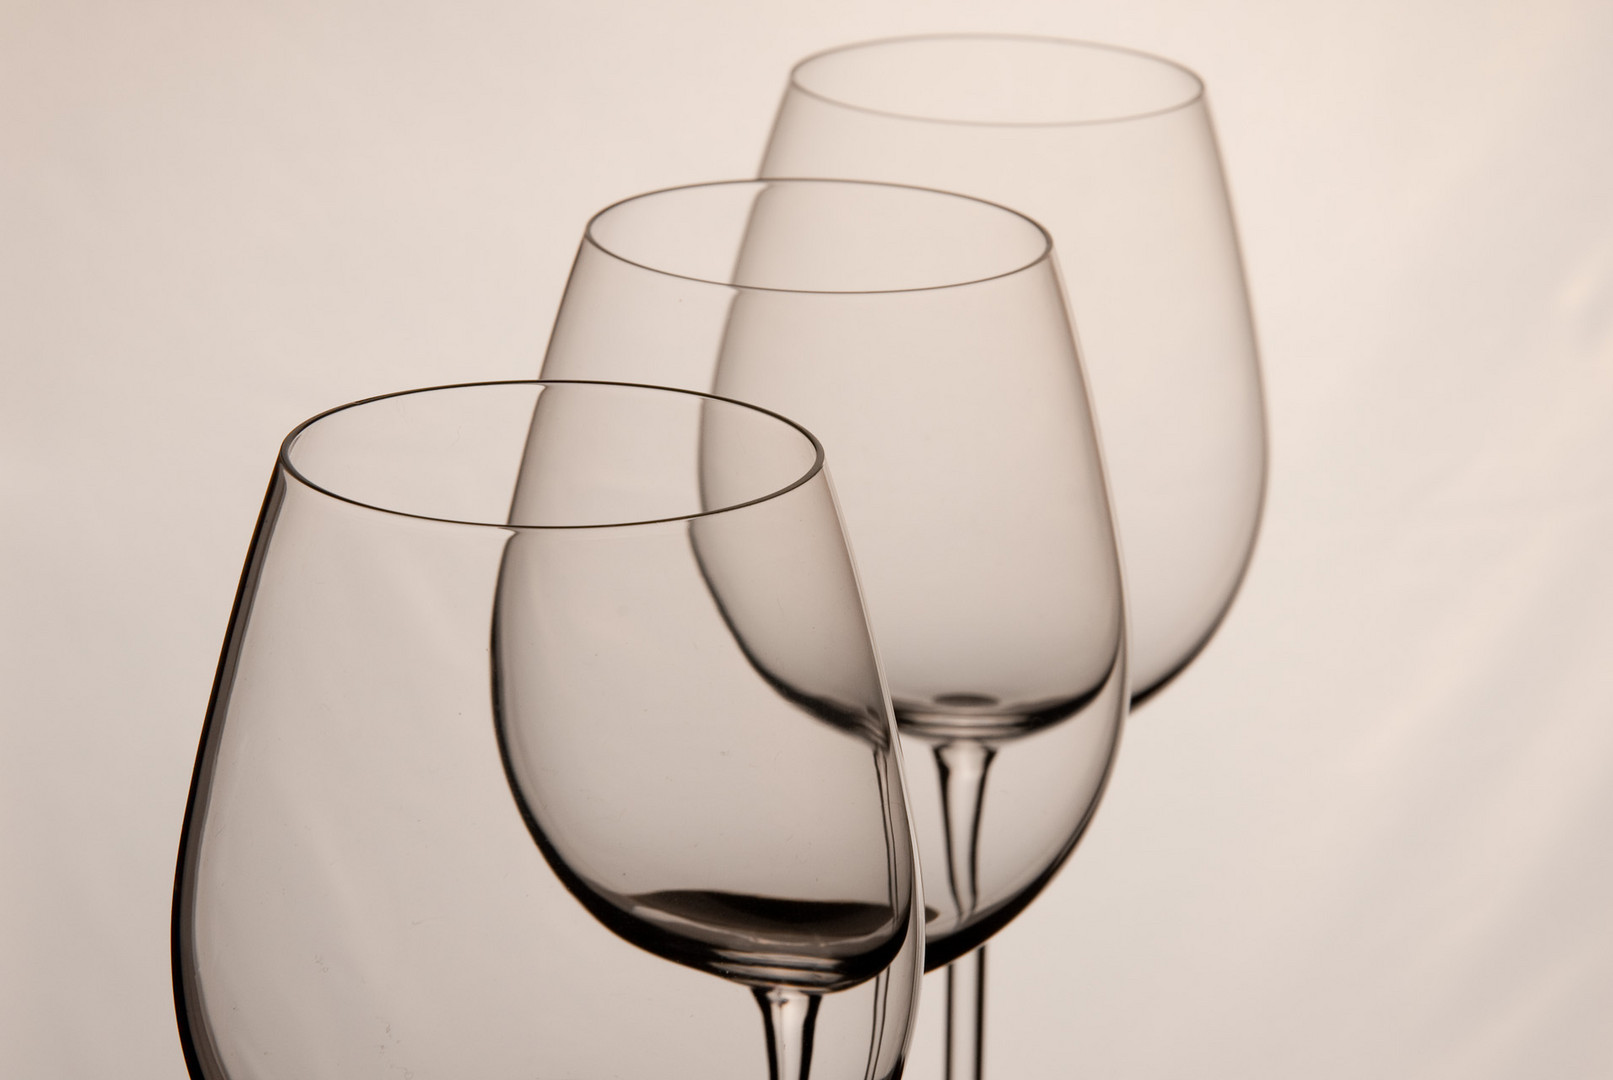 ...drei Gläser ...im hellen Studio